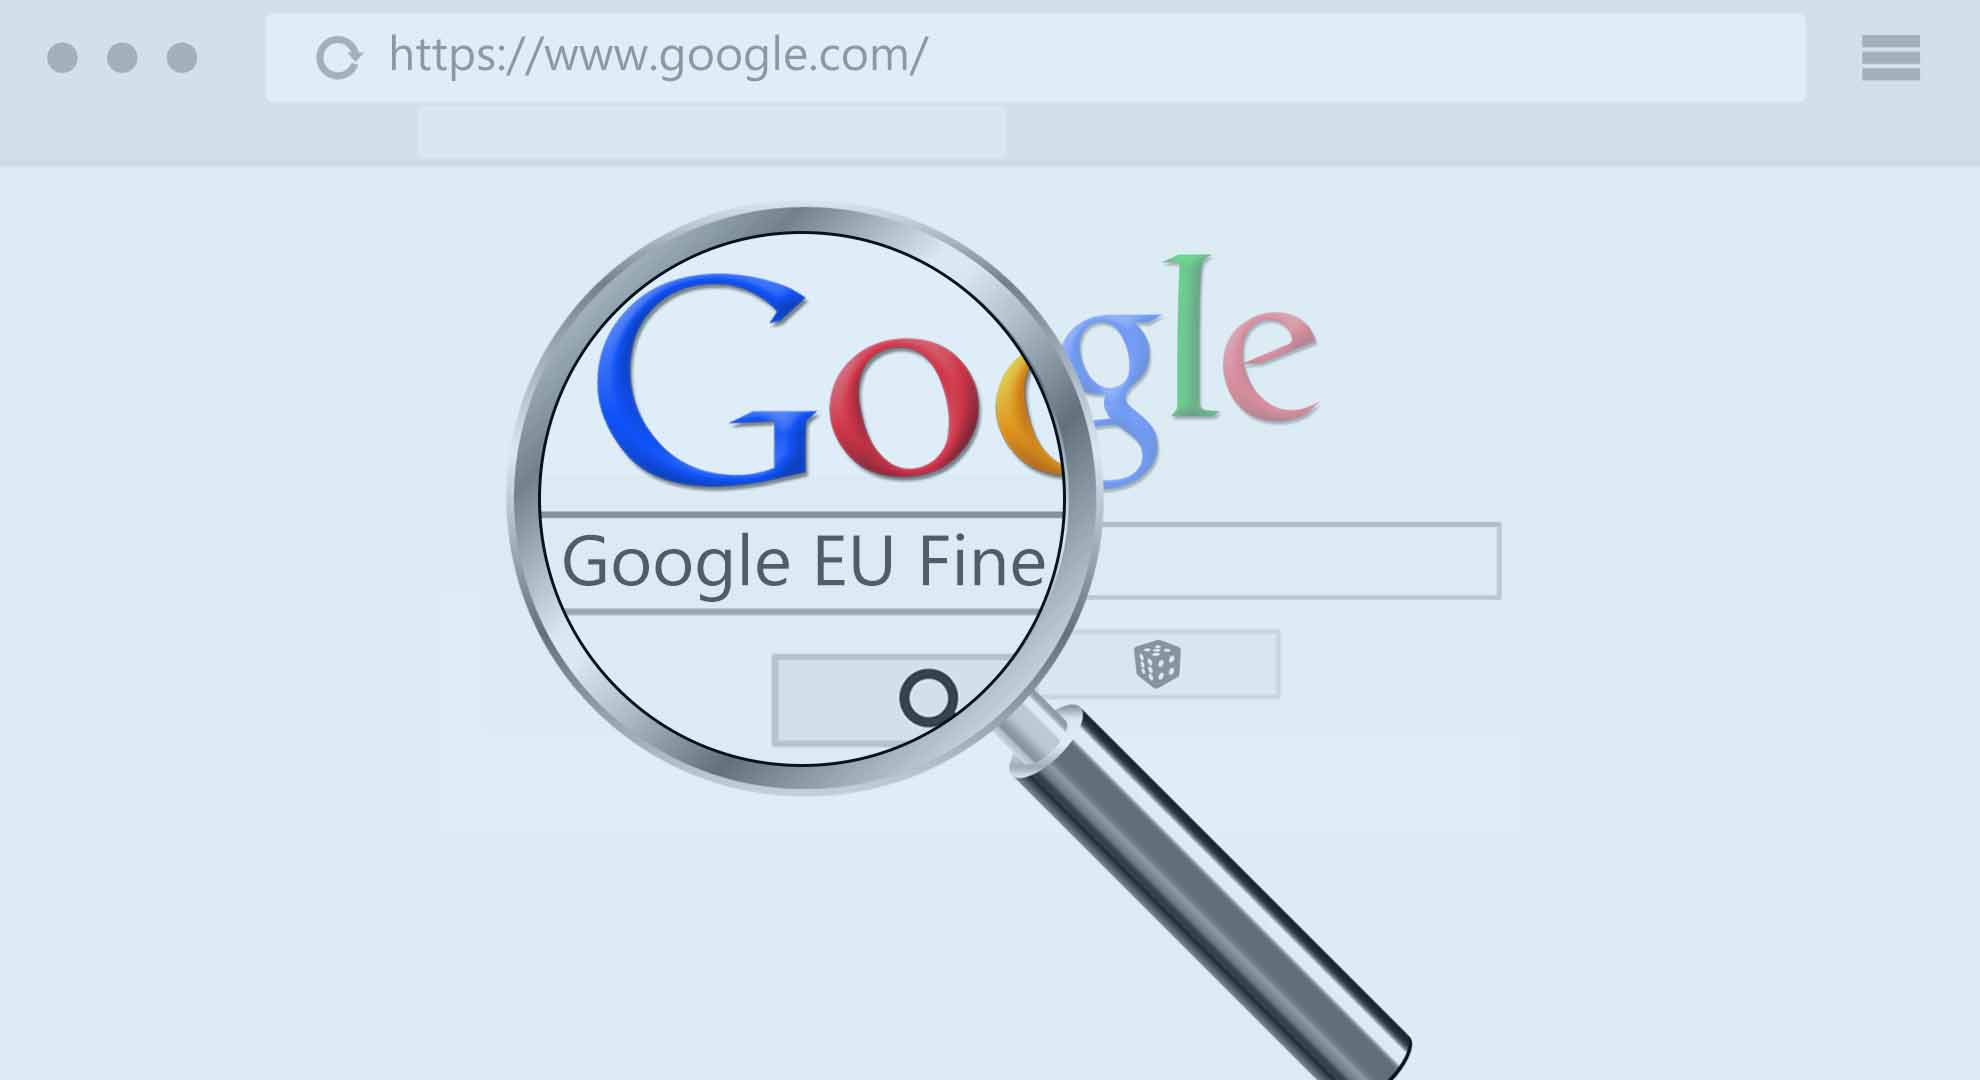 Android Antitrust Abuse: EU Imposed Fine of $5 Billion on Google